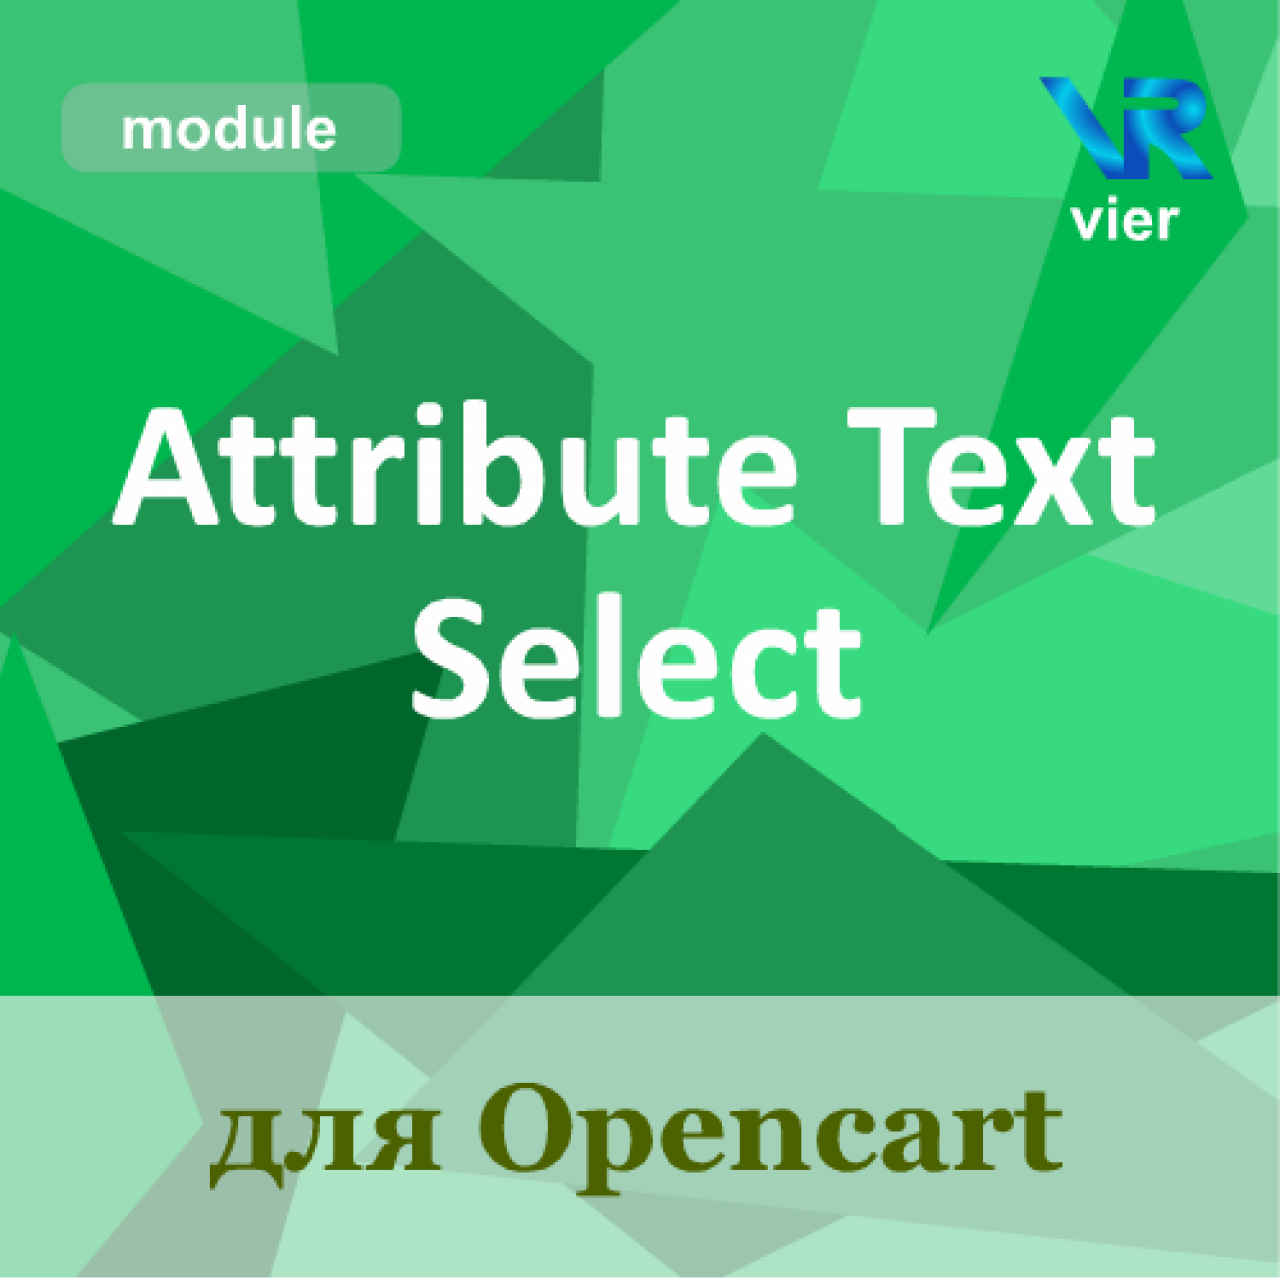 Attribute Text Select из категории Атрибуты для CMS OpenCart (ОпенКарт)